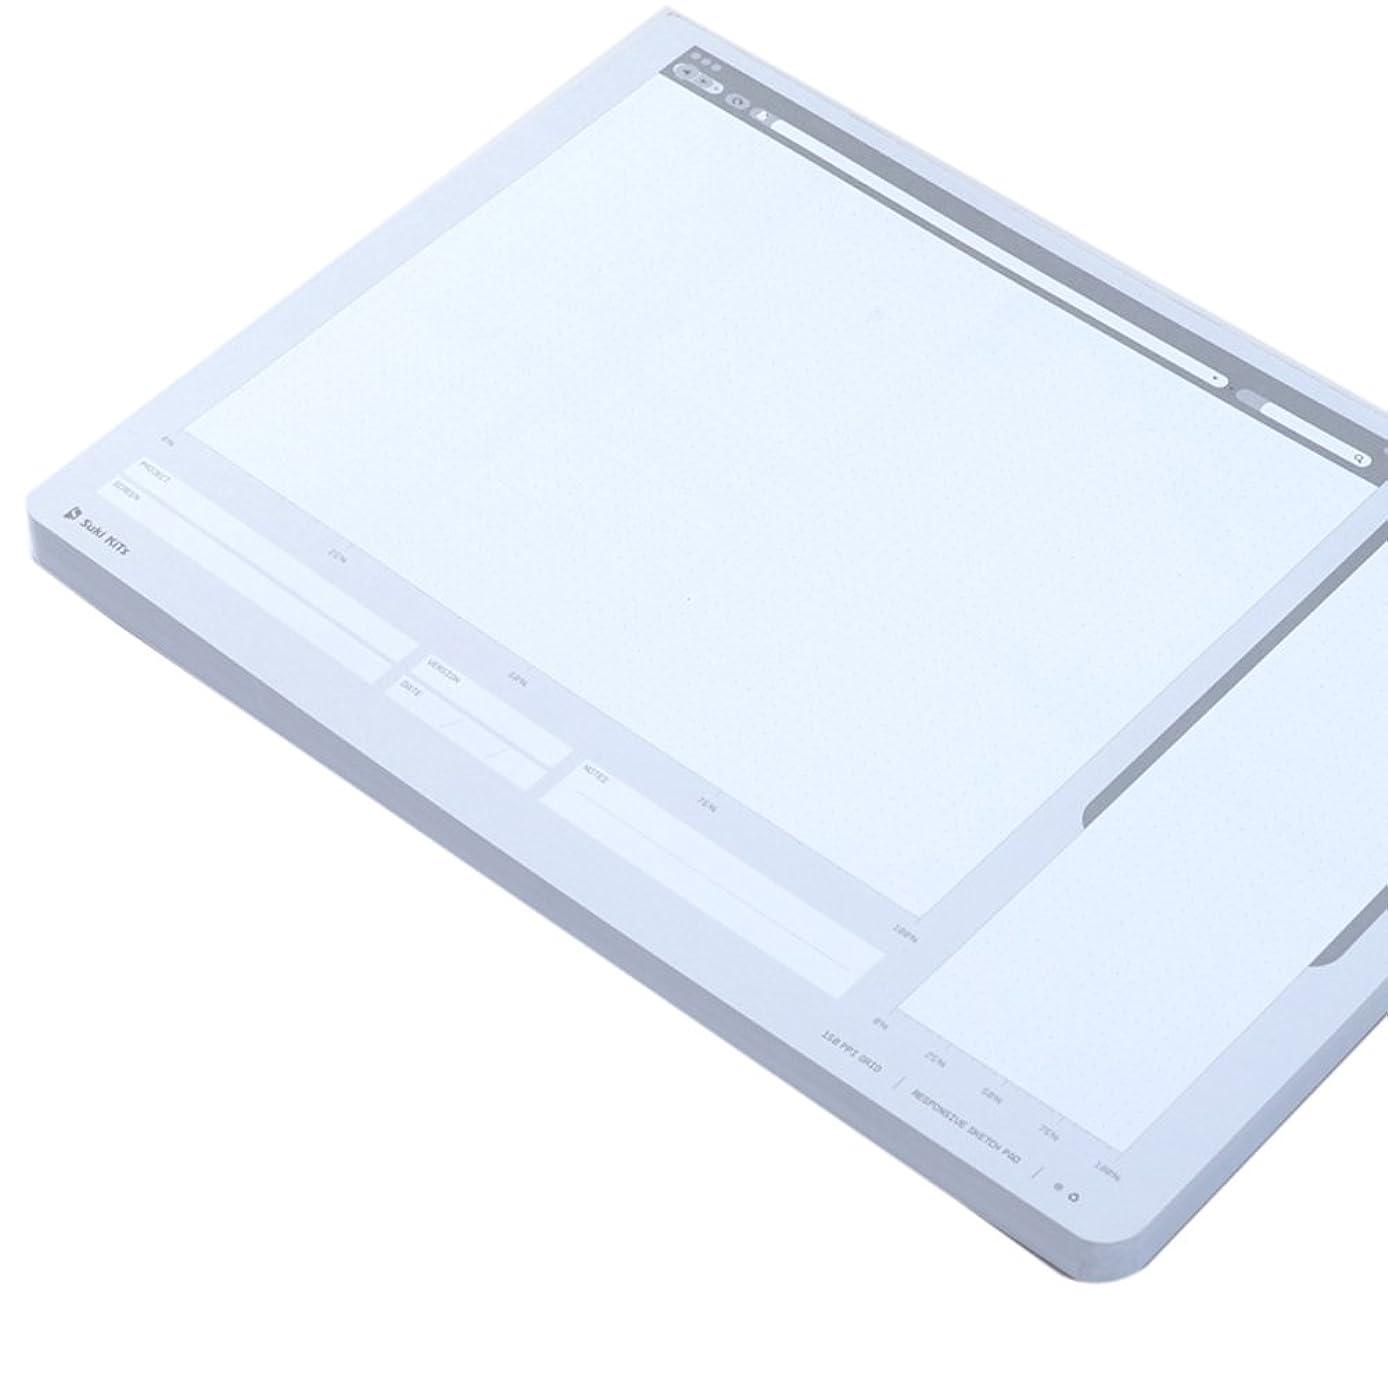 Loghot Creative Draft Drawing UI Design Responsive Sketch Pad for App Design Template